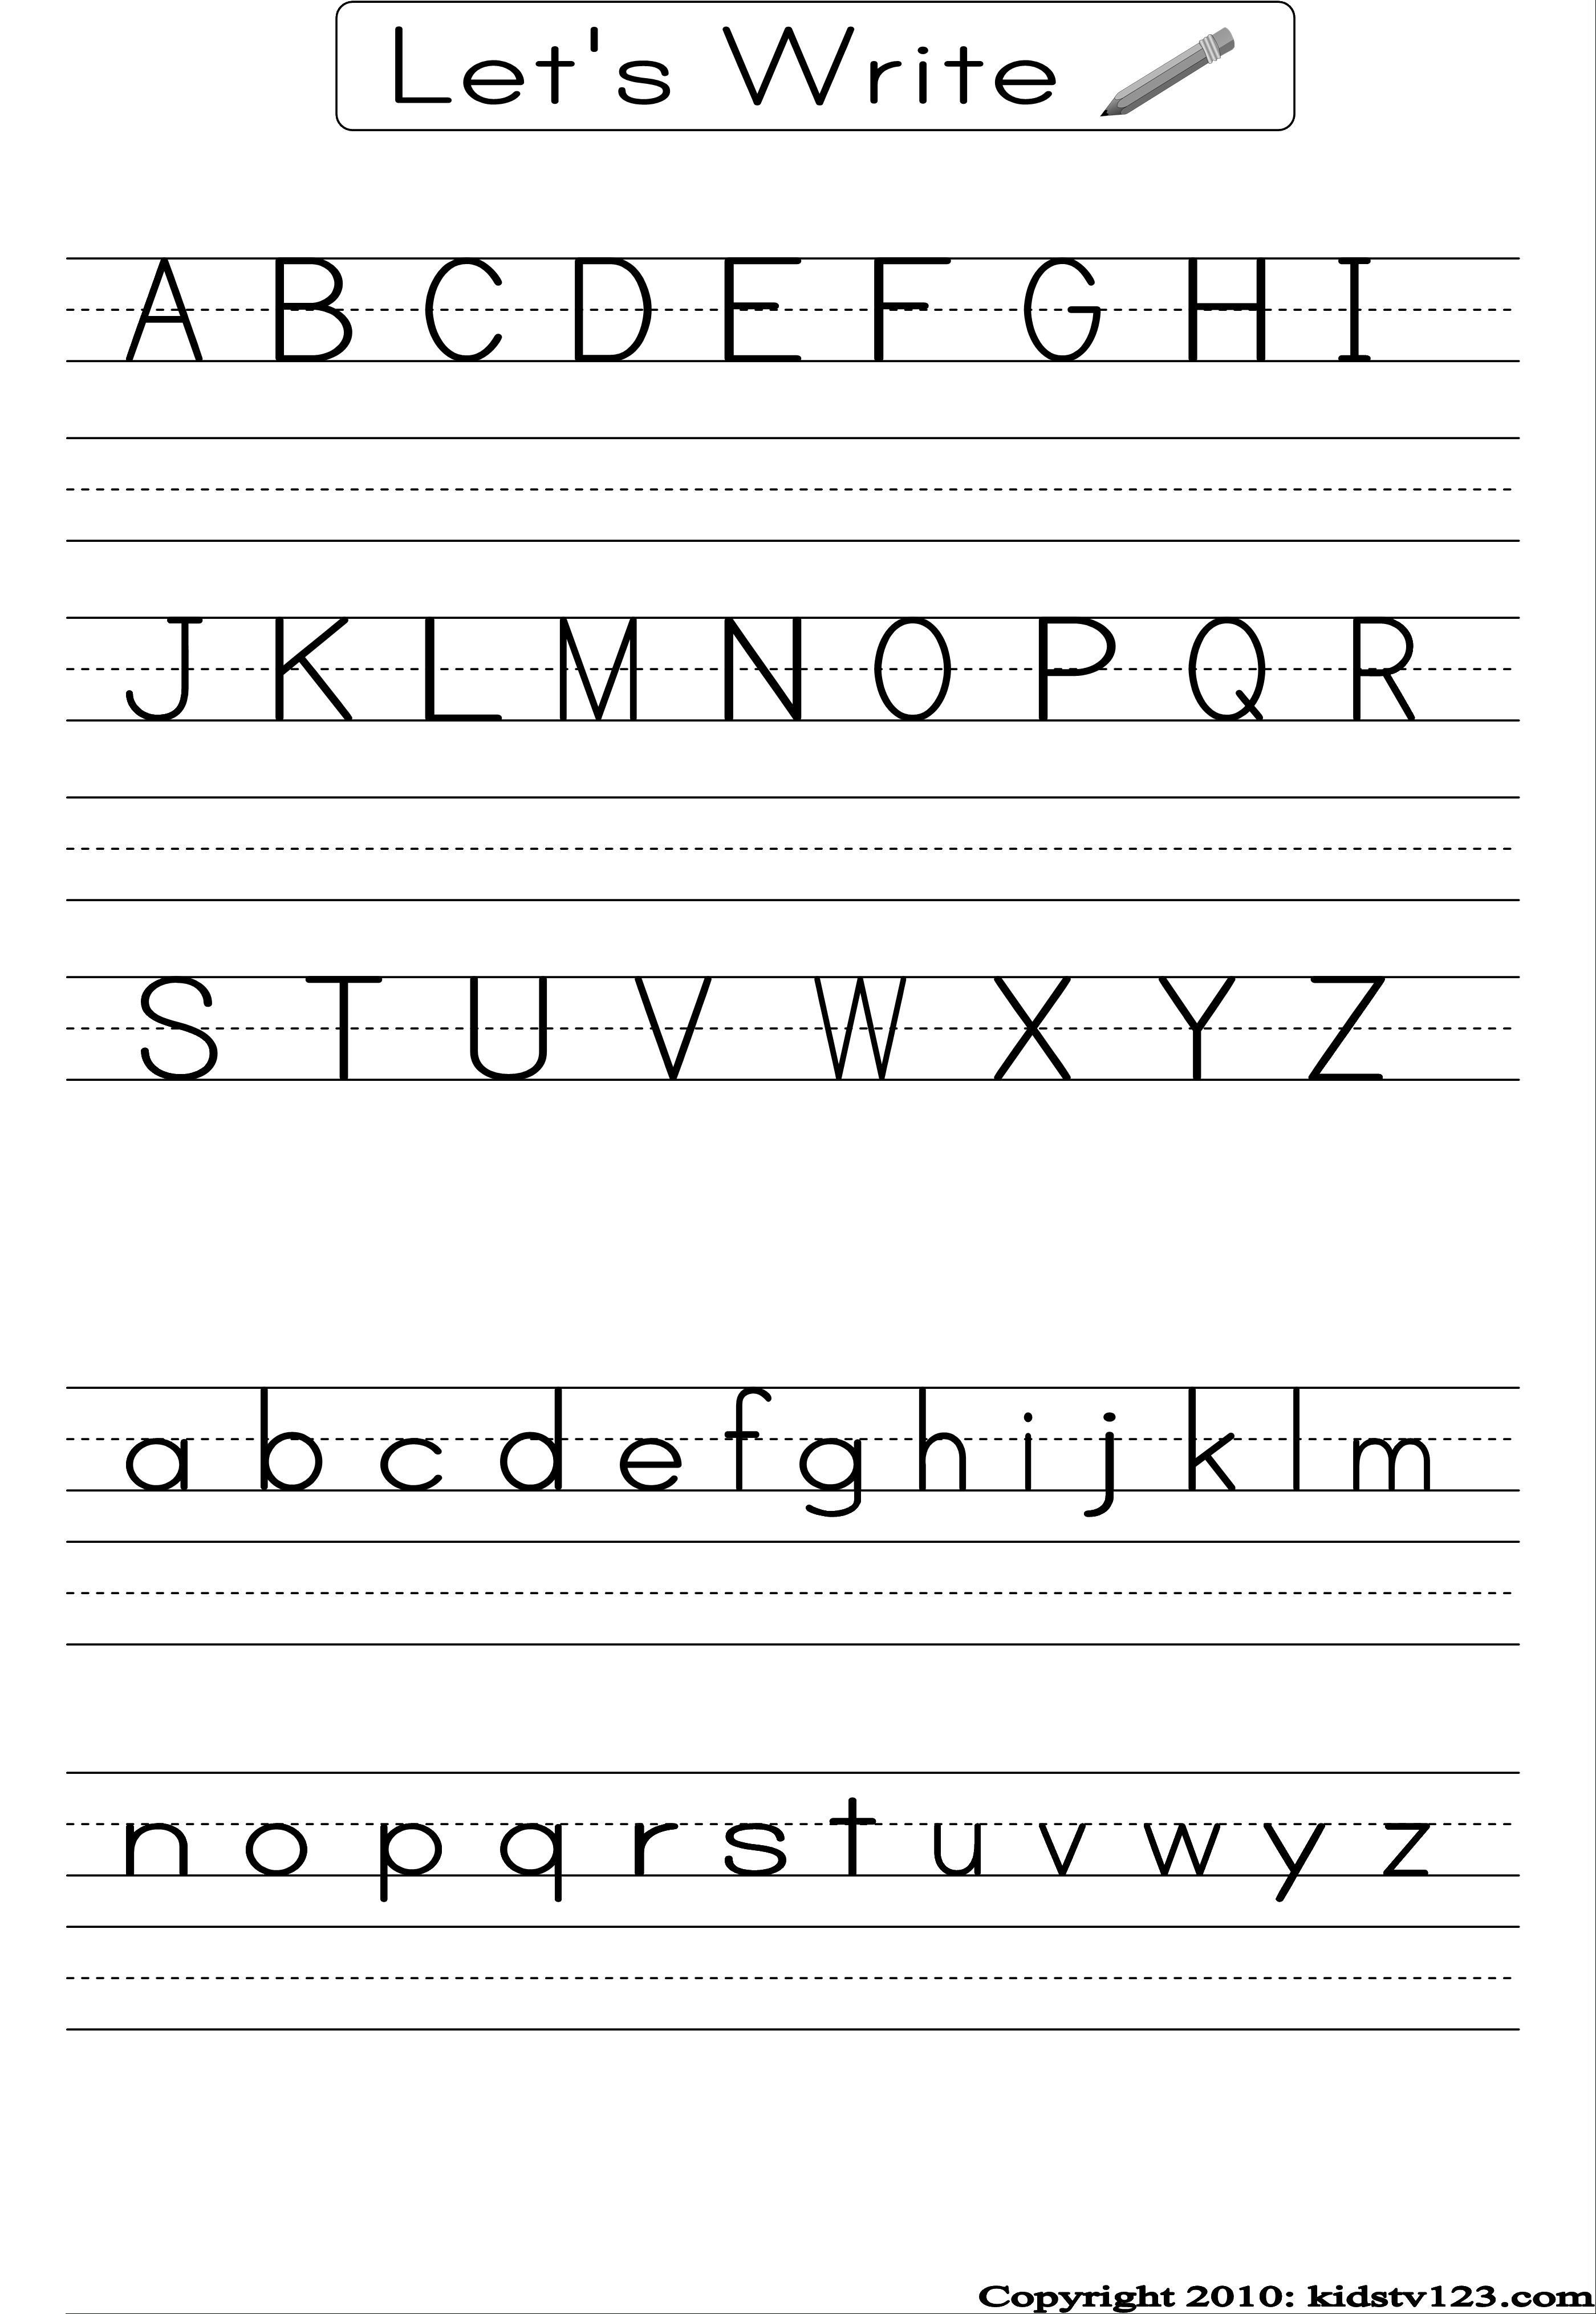 Alphabet Writing Practice Sheet | Edu-Fun | Alphabet Worksheets - Free Printable Alphabet Worksheets